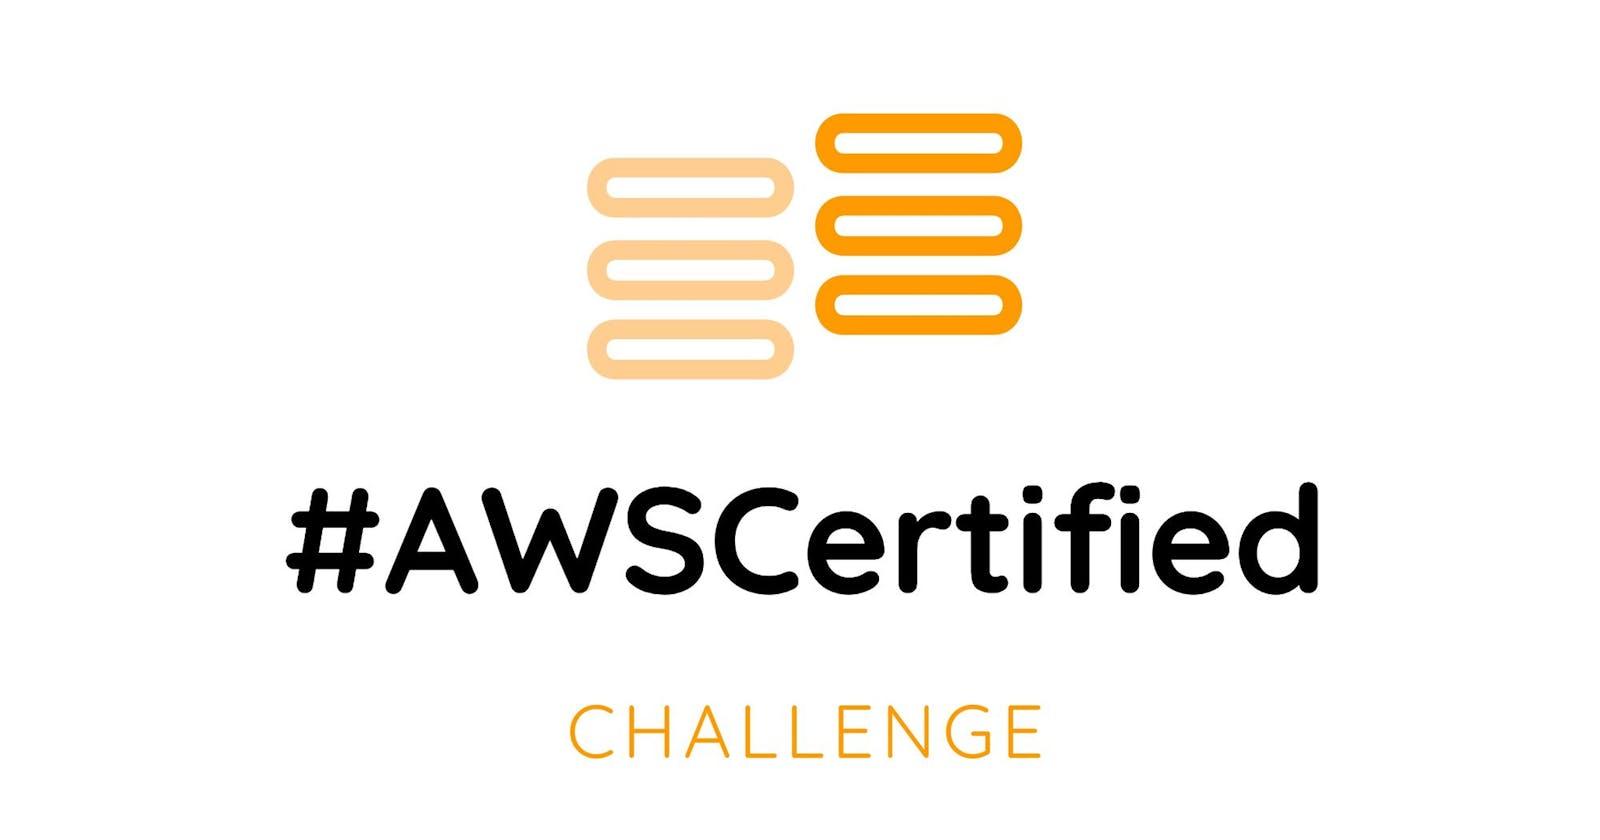 Cloud Resume Challenge - Part 1: The Challenge Explained